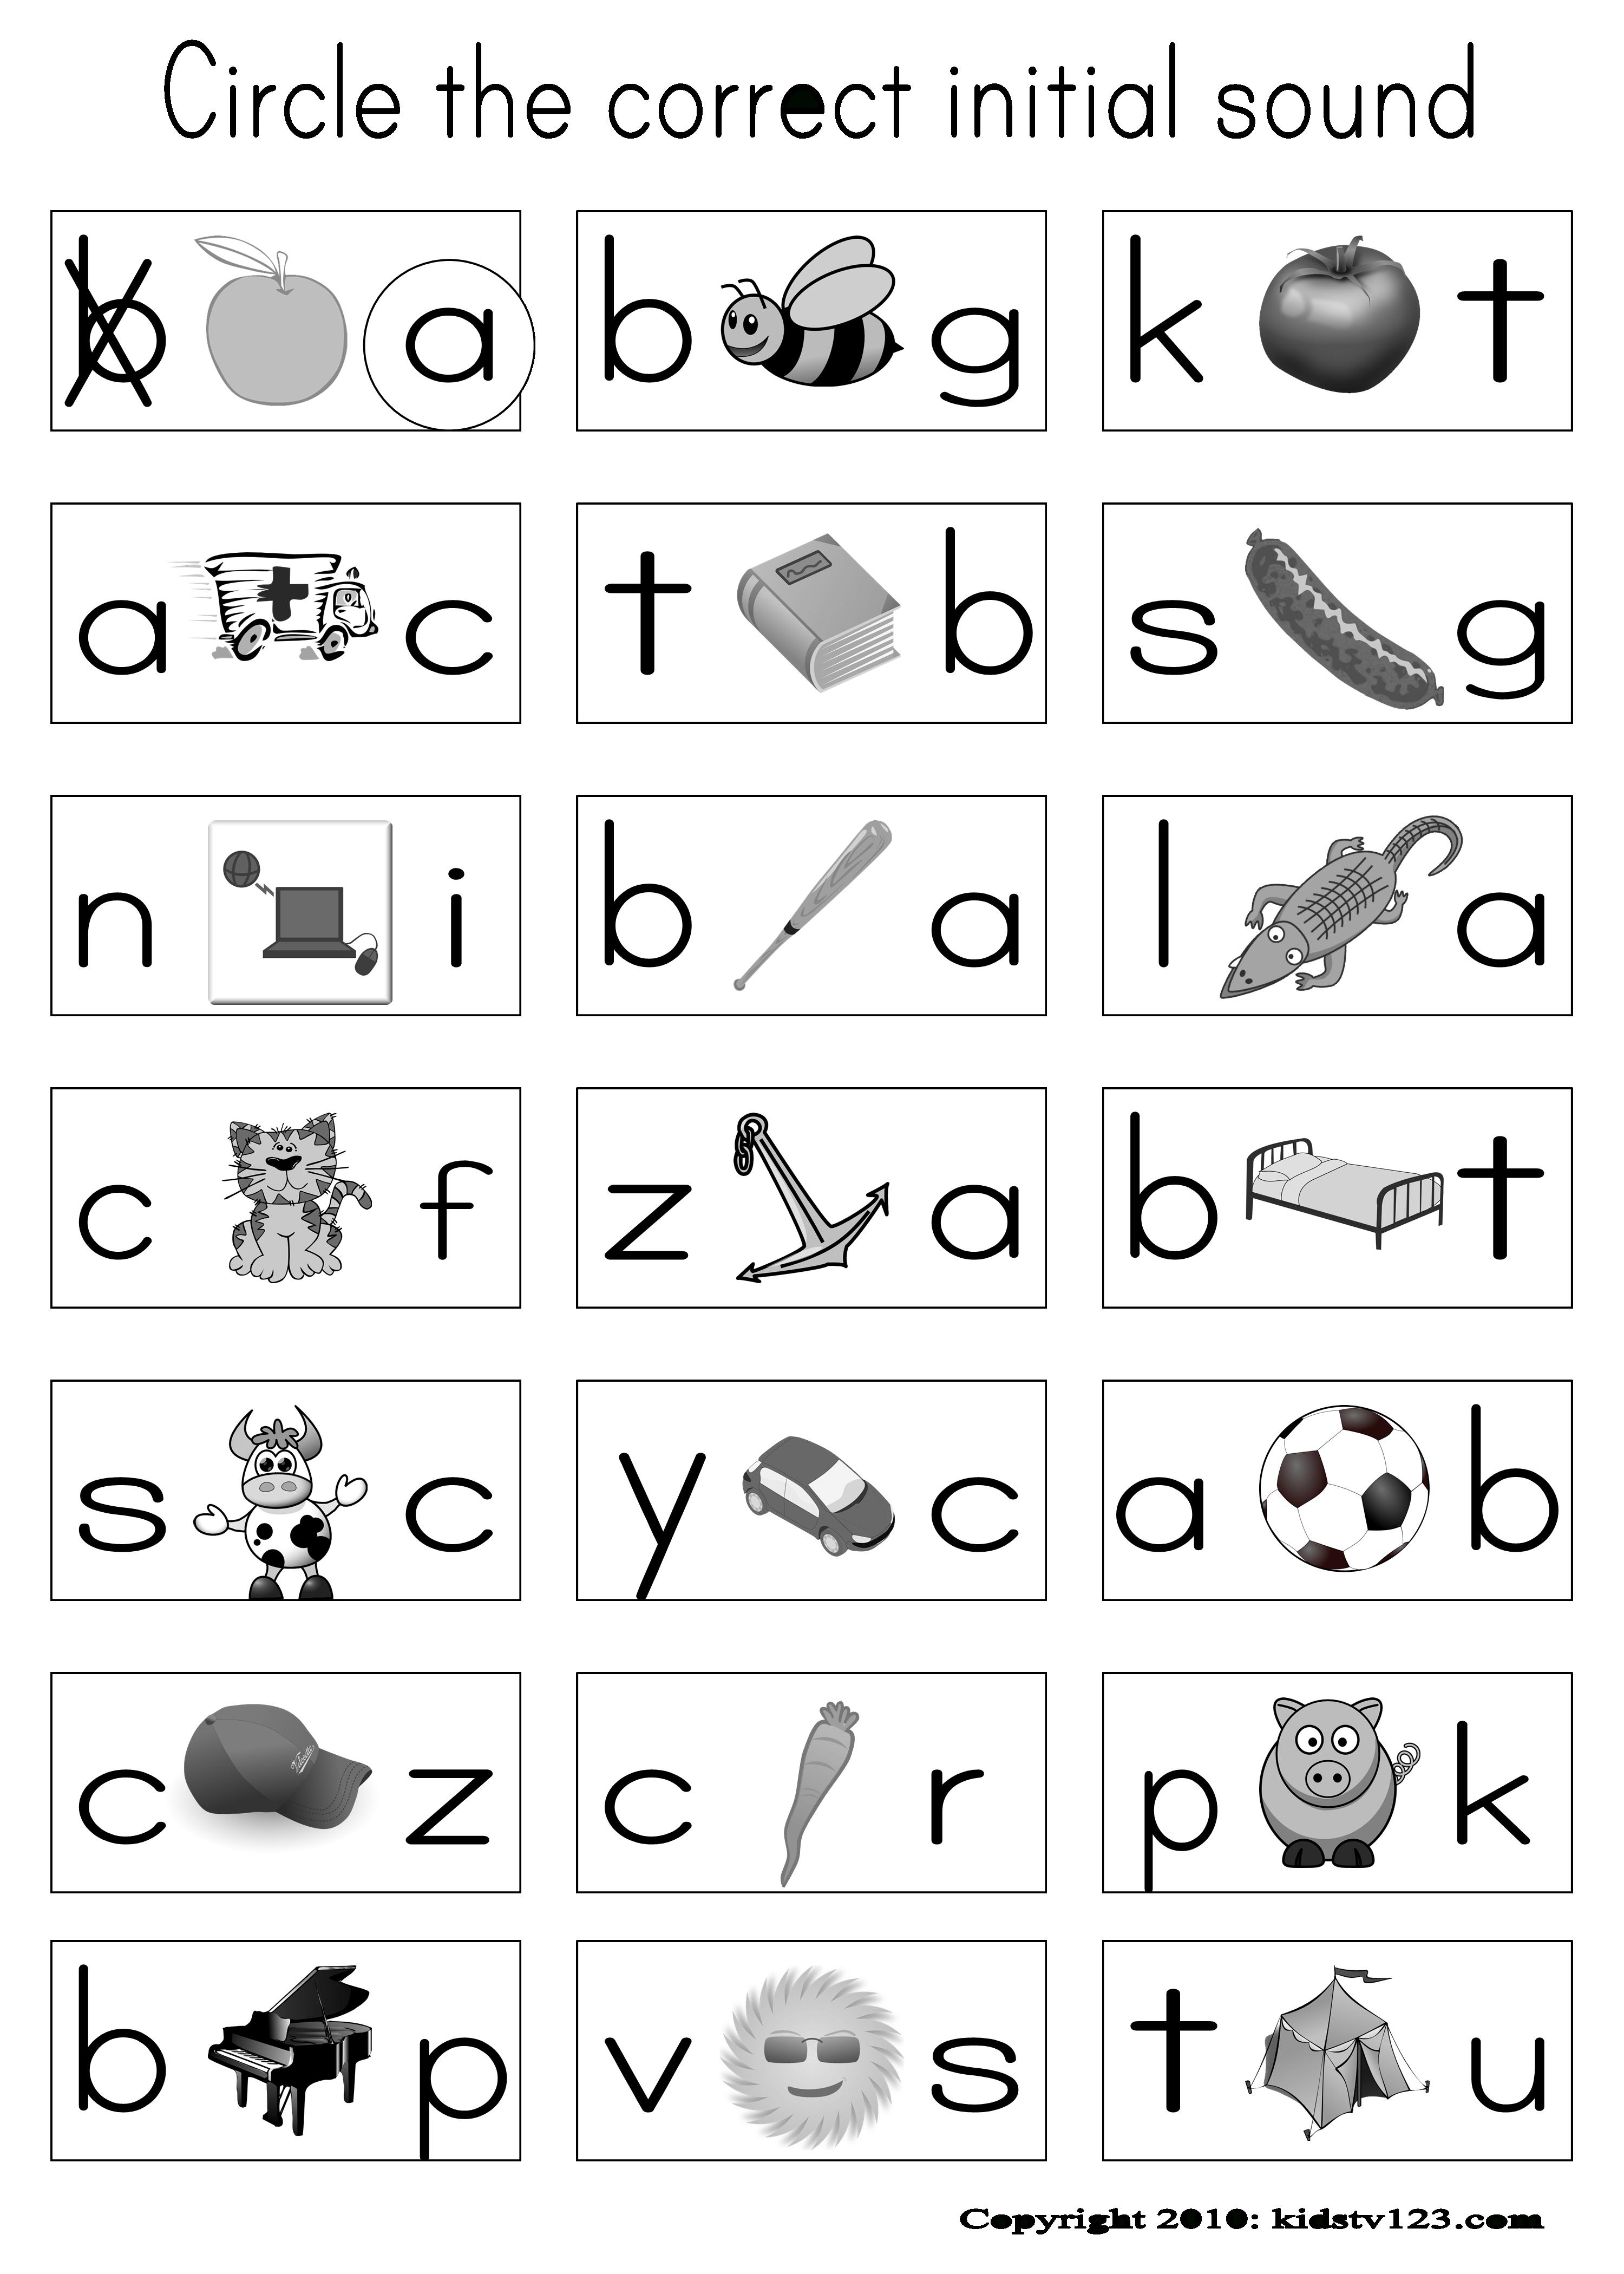 Kidstv123 - Phonics Worksheets | Phonics Kindergarten inside Alphabet Phonics Worksheets